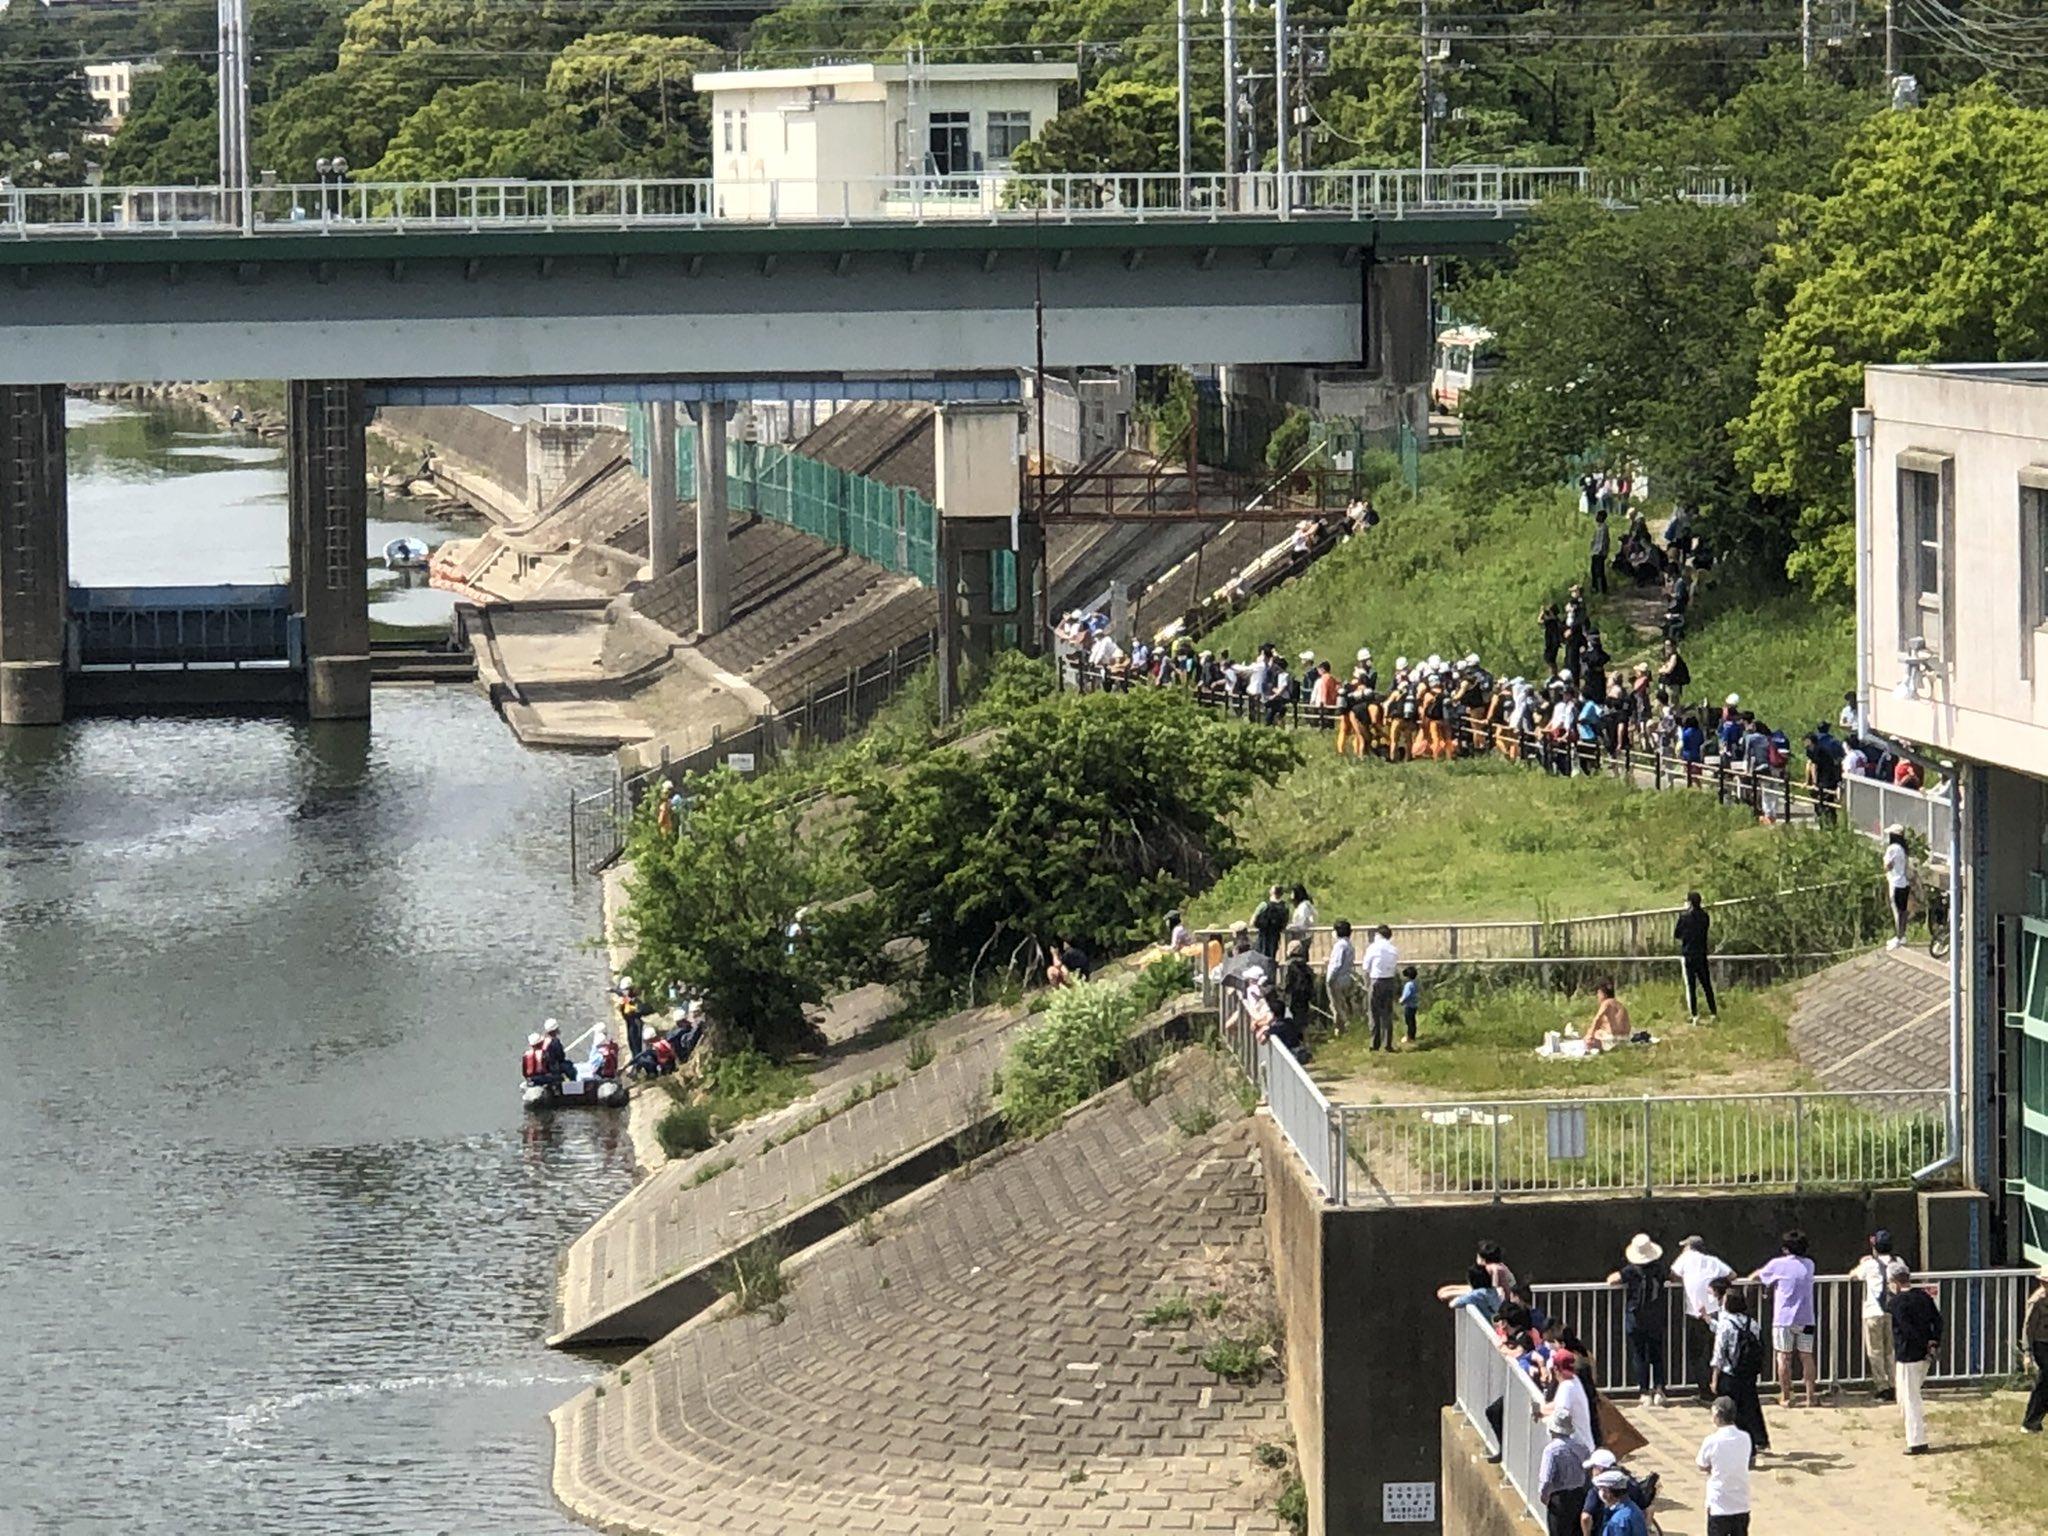 多摩川 丸子橋広場前の水難事故の現場画像